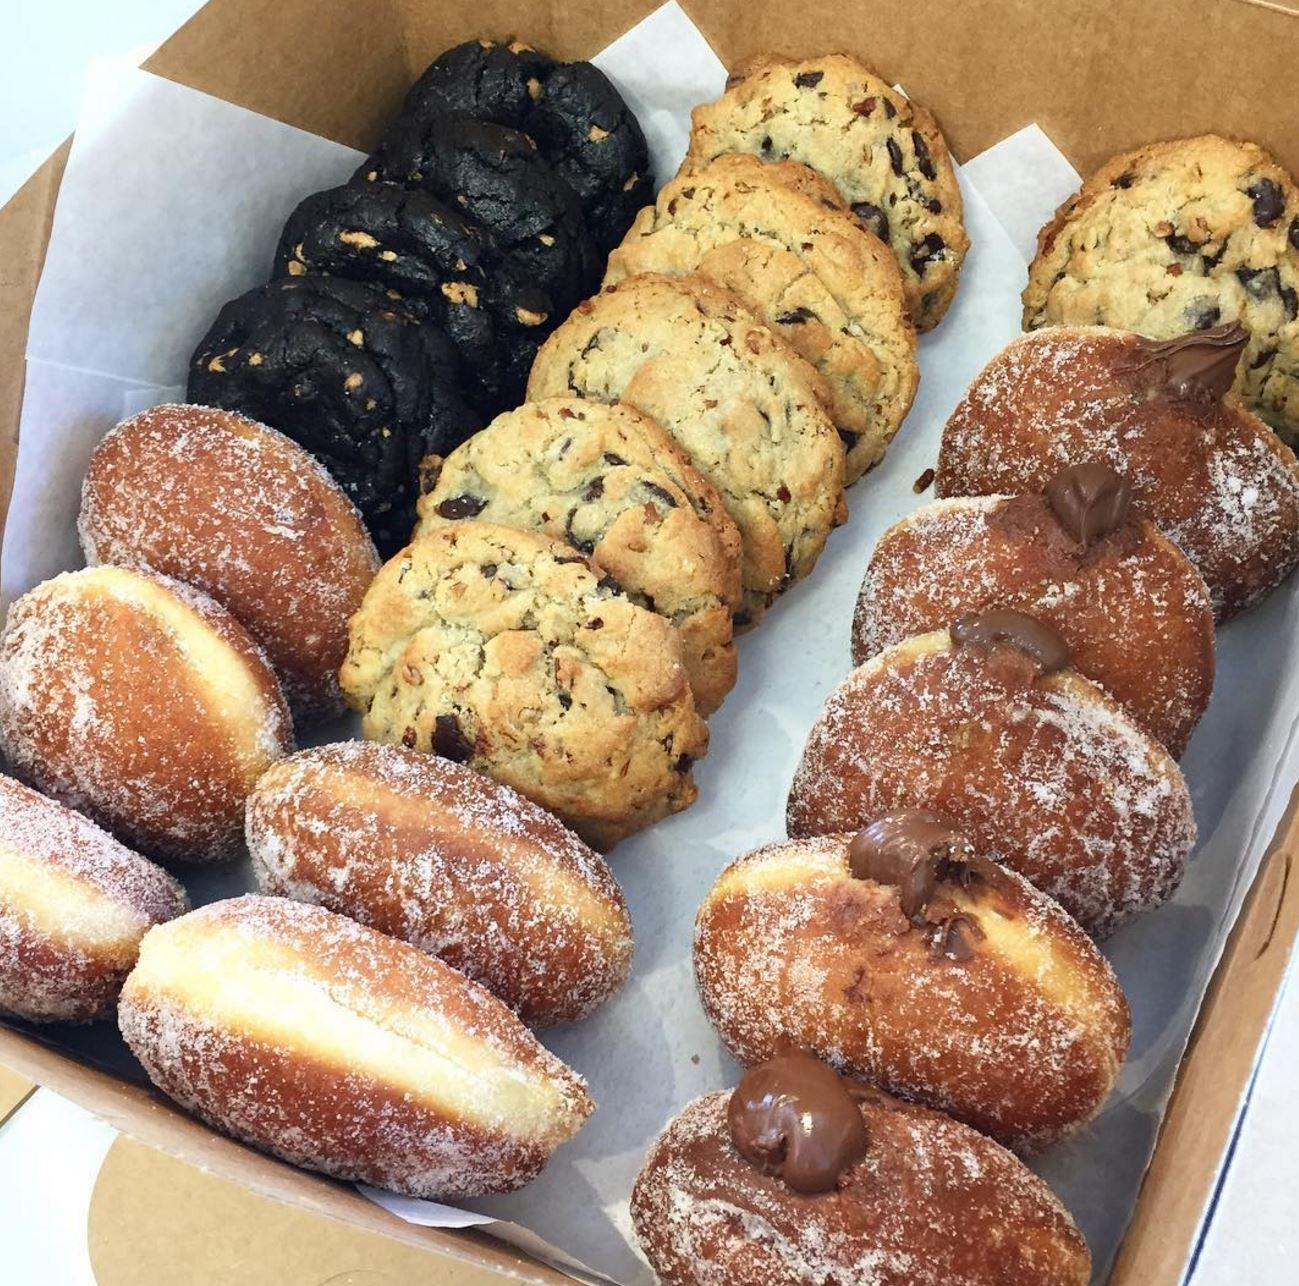 April 29 | Paderia Bakehouse in Fountain Valley Gives Out Free Malasadas